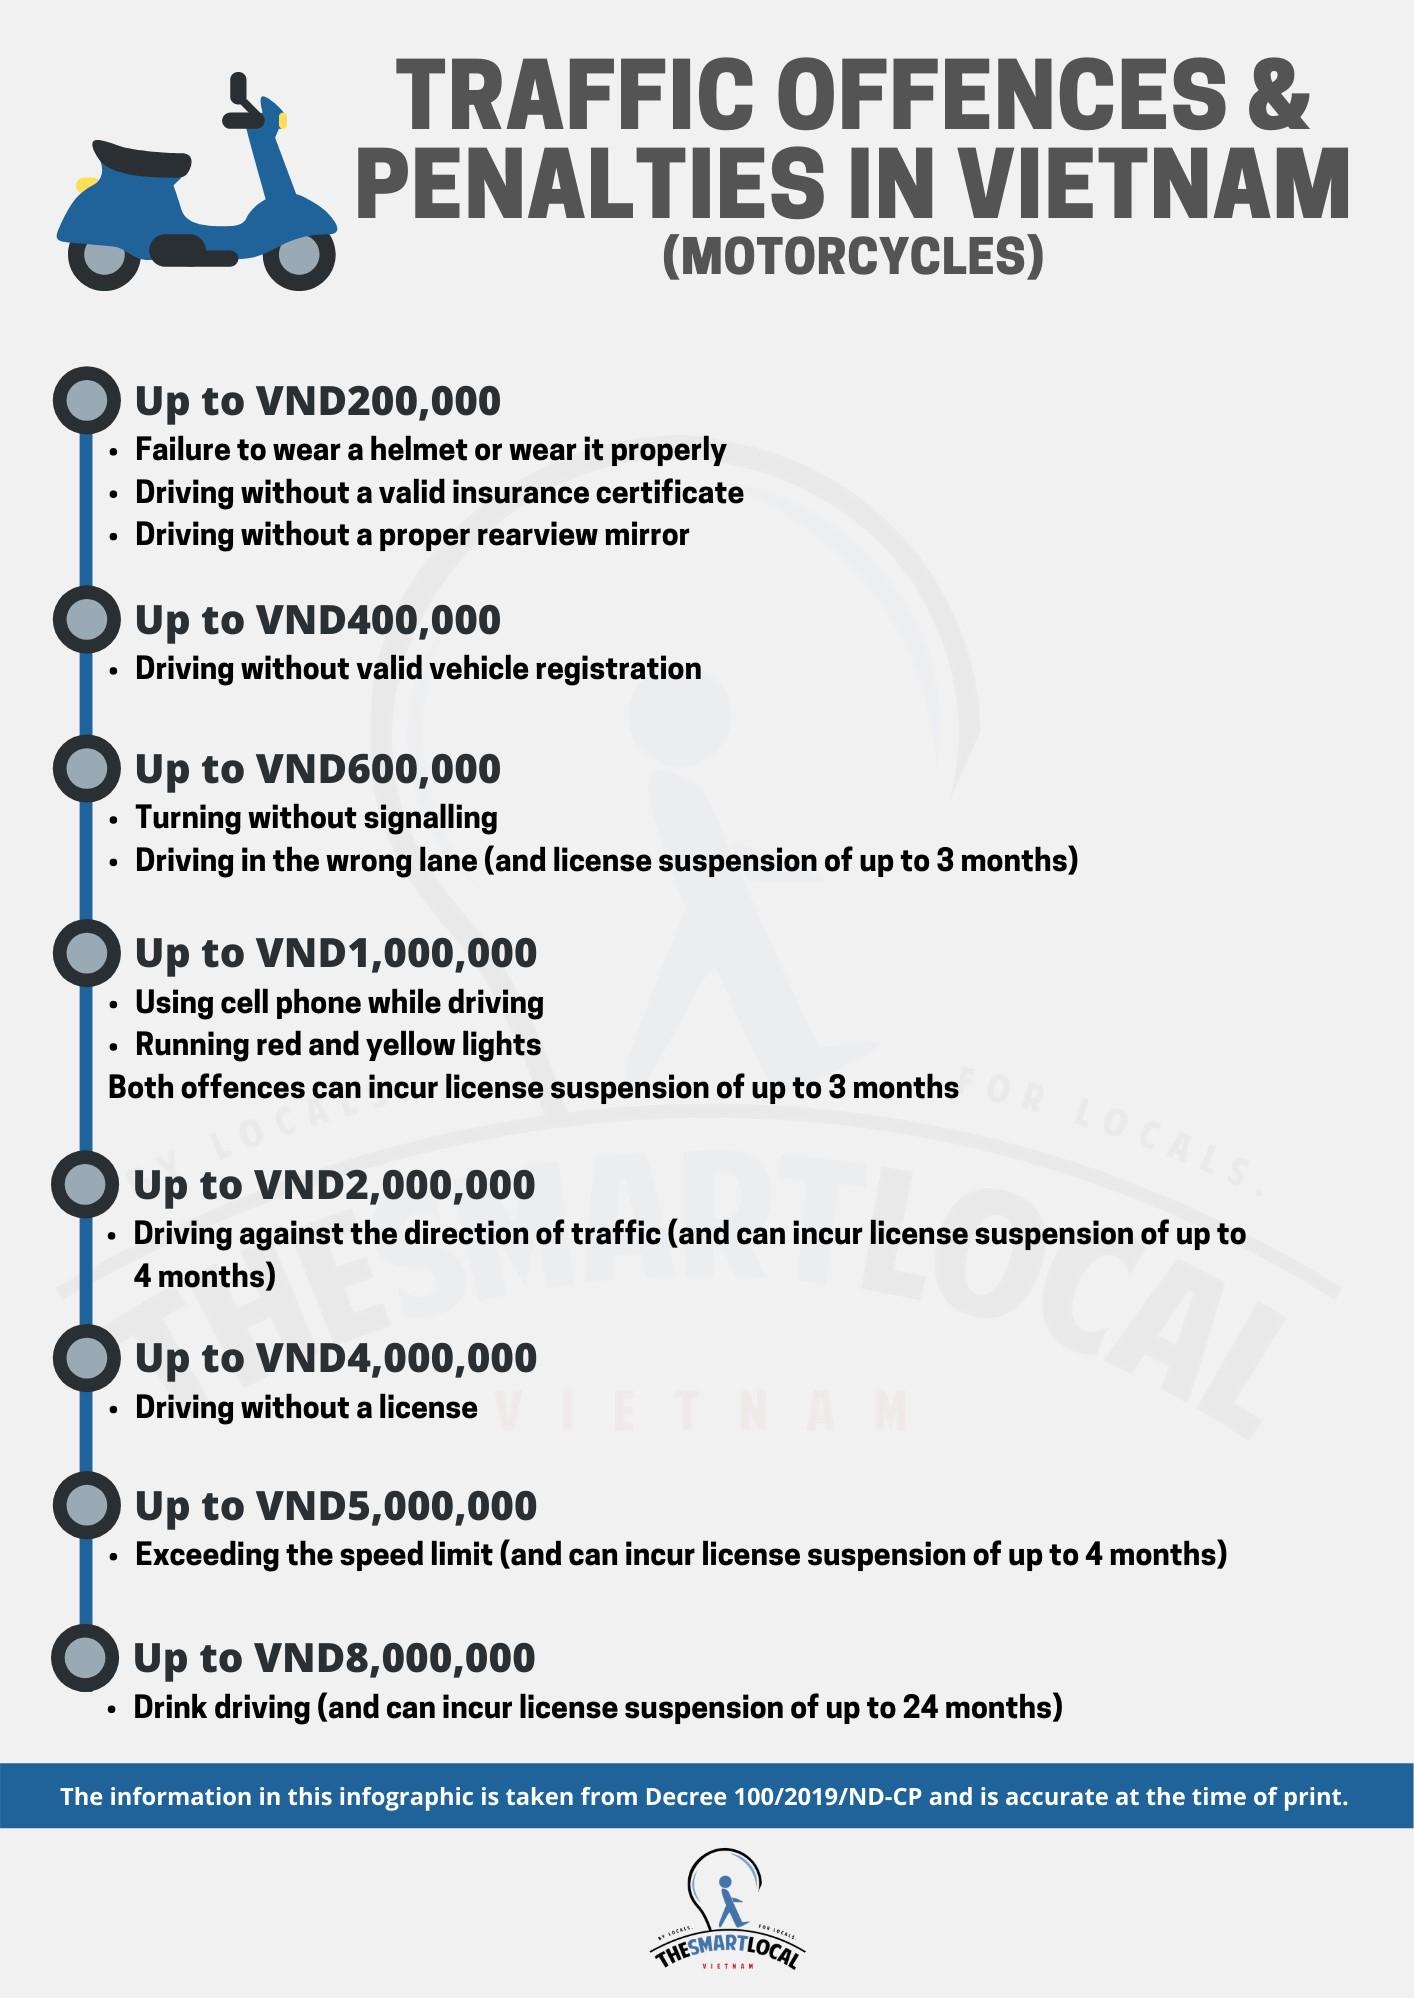 Vietnamese traffic offenses